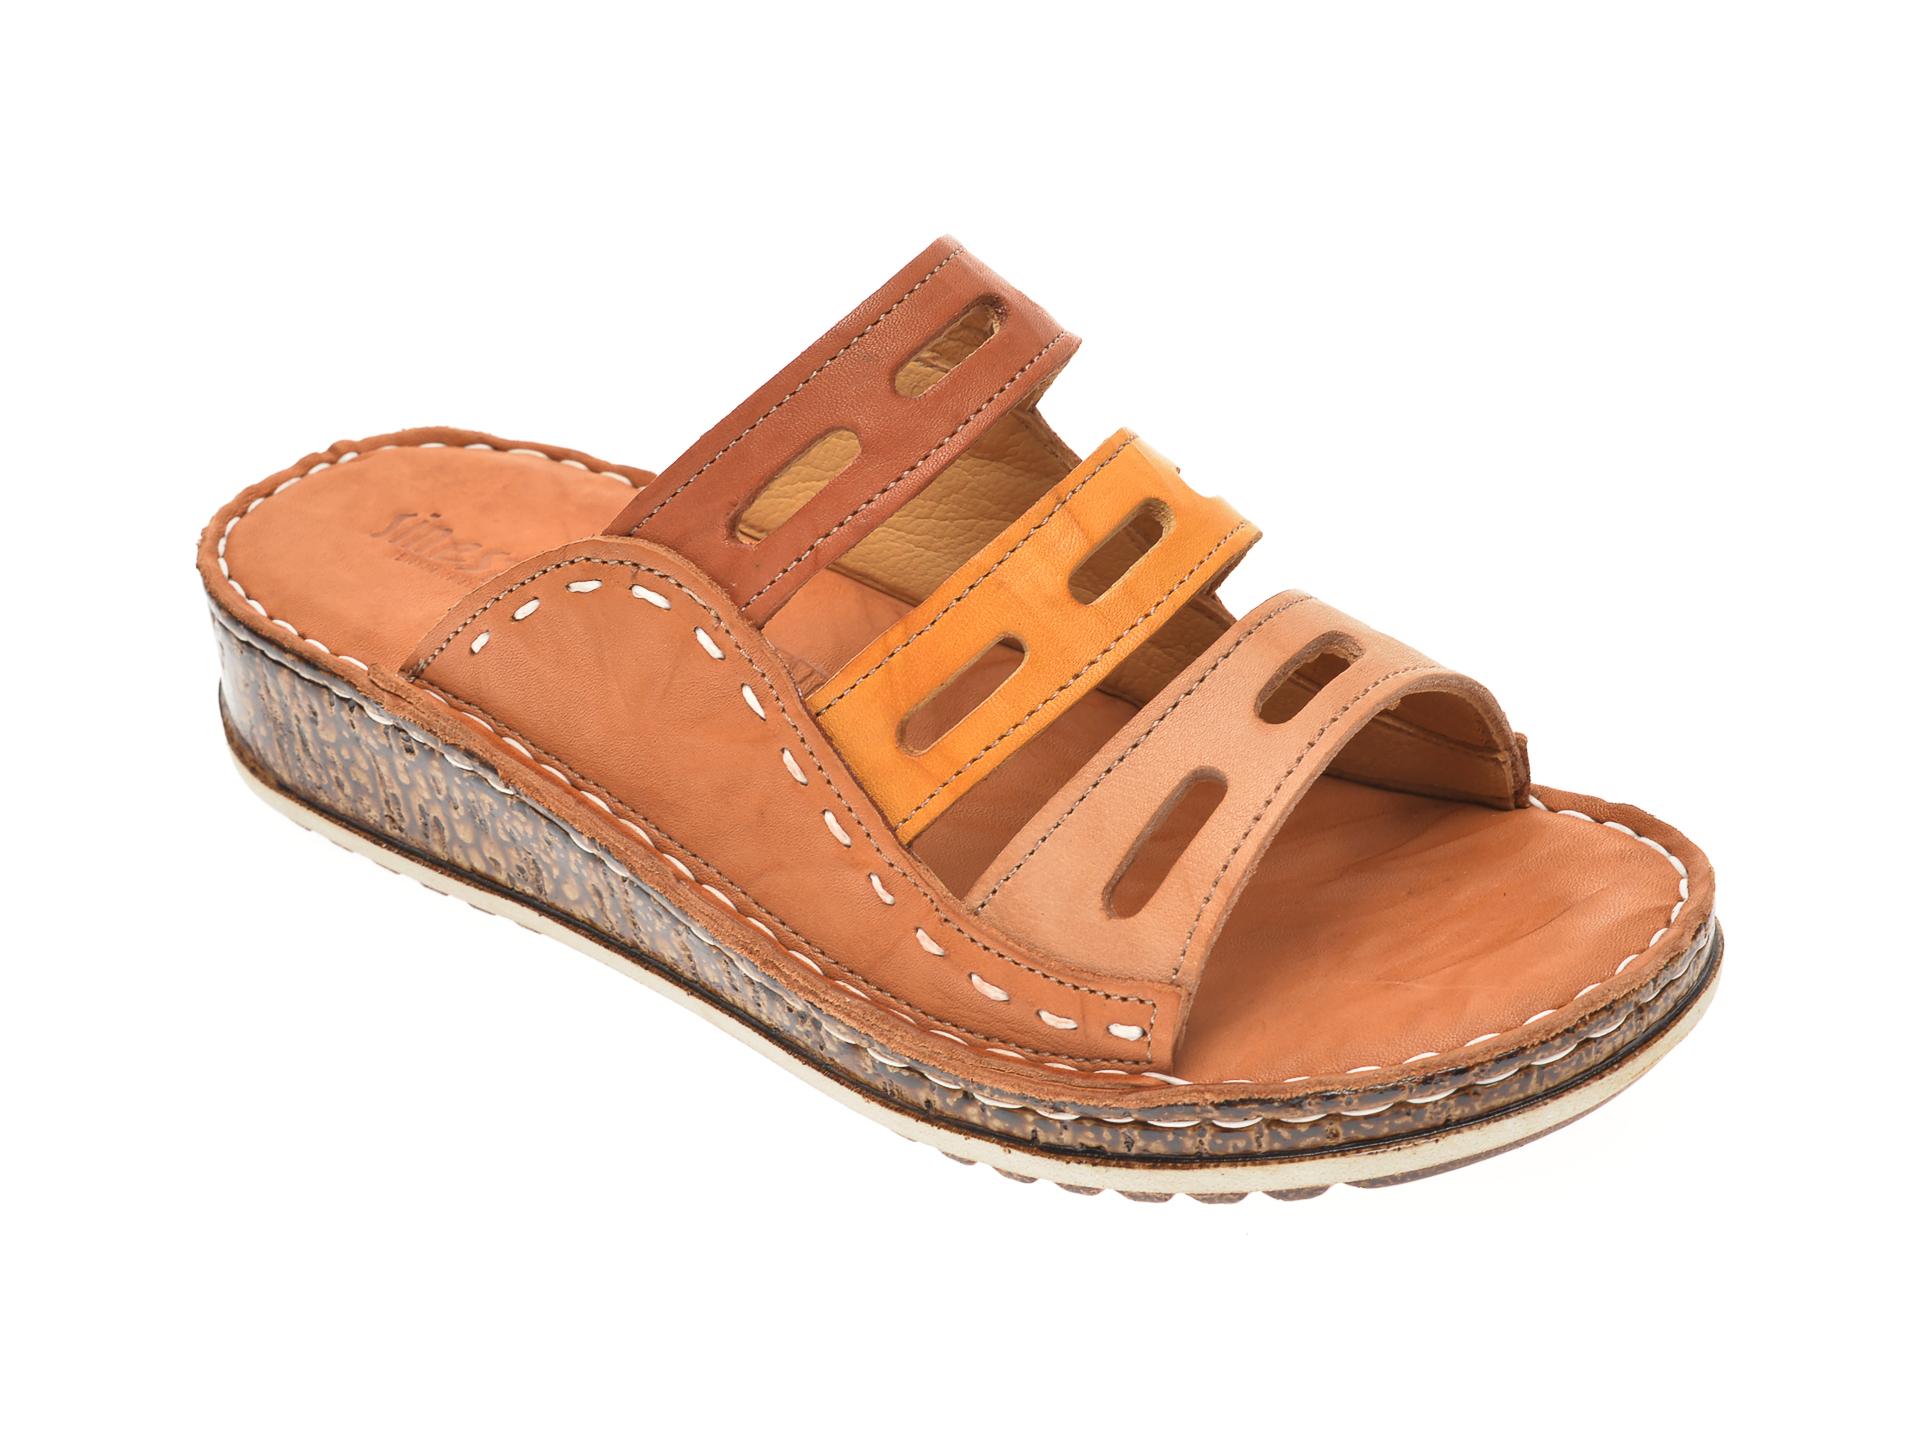 Papuci SINESTRESS maro, 1347, din piele naturala